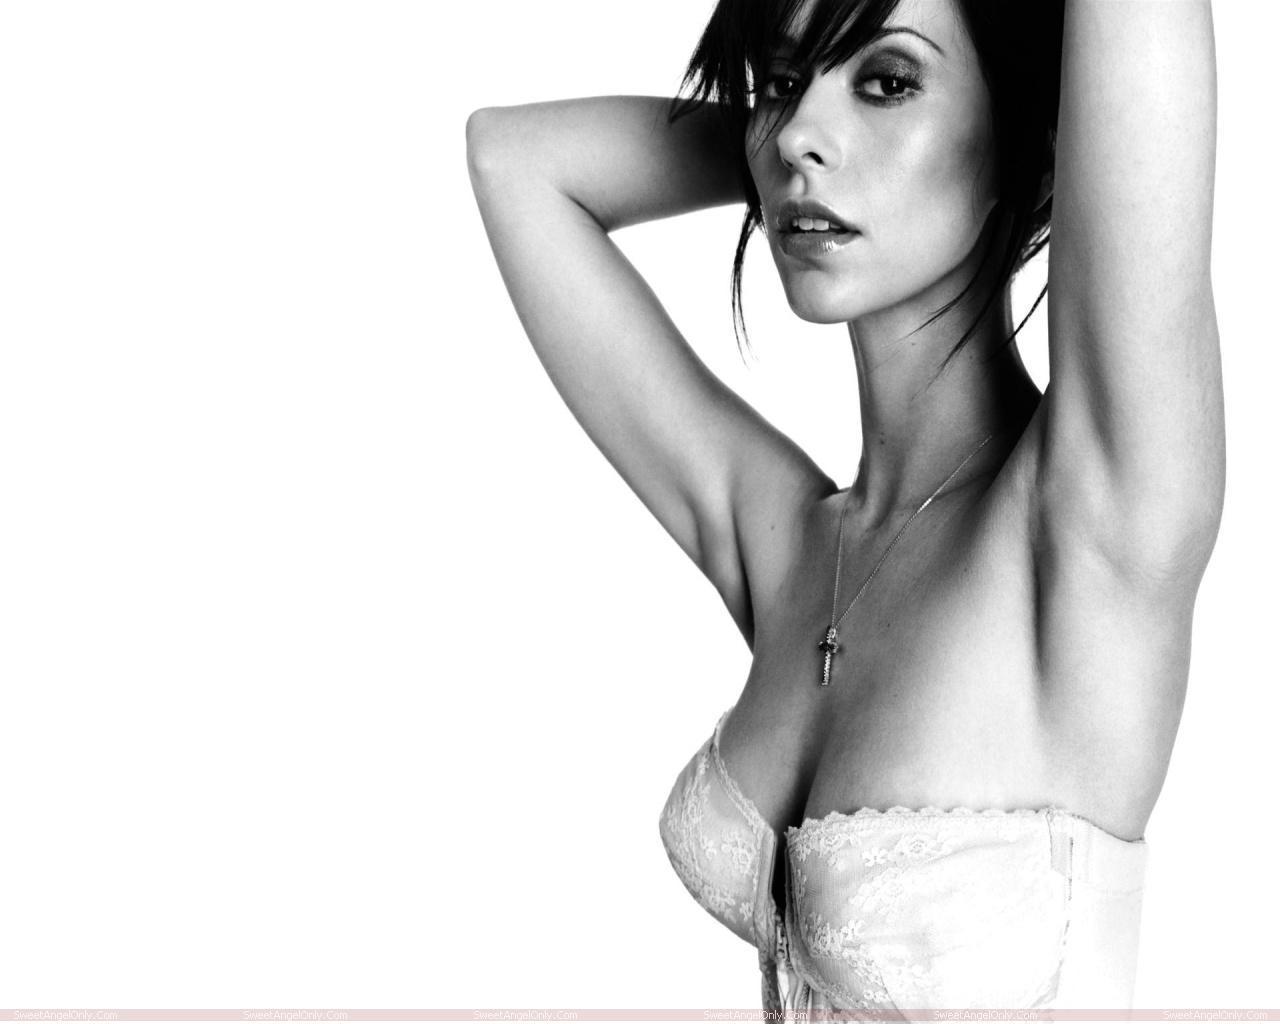 http://3.bp.blogspot.com/-CS08fkNoVRQ/TW4w_11Ti-I/AAAAAAAAE1Q/nXbMSynKieU/s1600/actress_jennifer_love_hewitt_hot_wallpapers_in_bikini_sweetangelonly_12.jpg